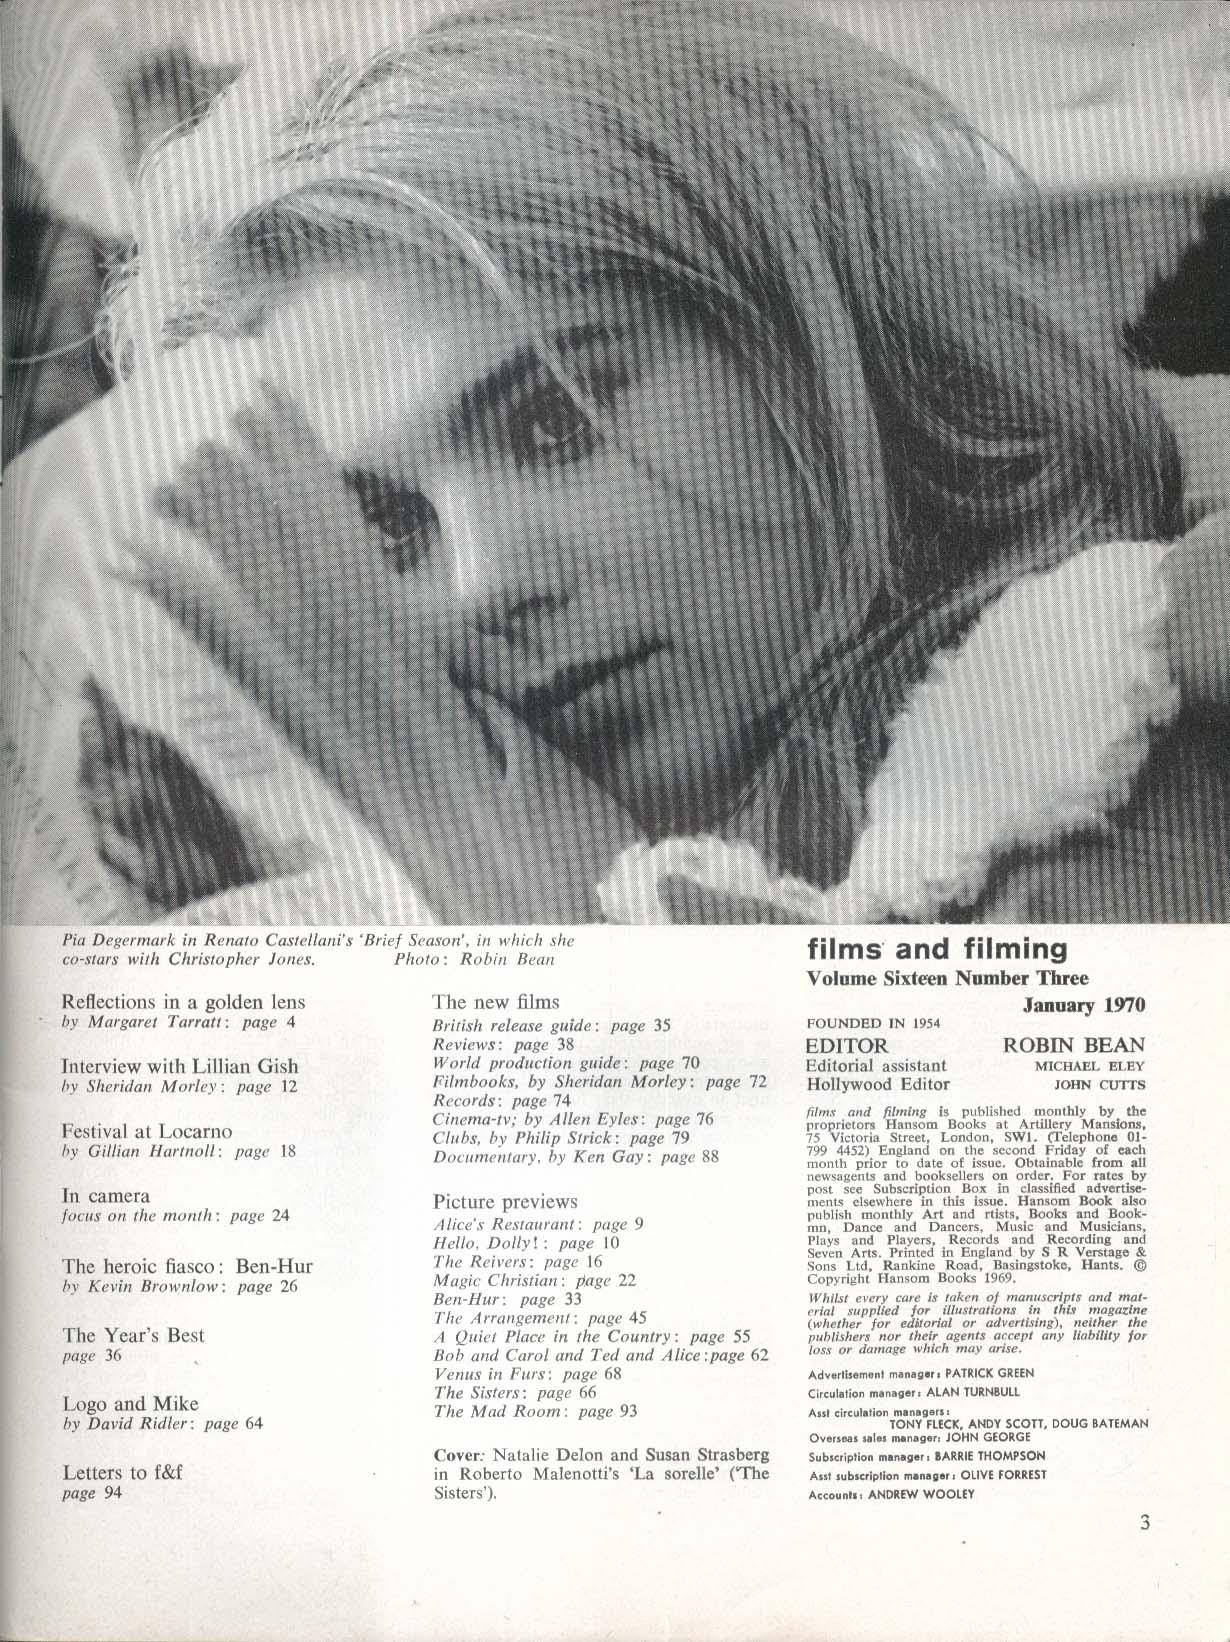 FILMS & FILMING Nathalie Delon Susan Strasberg Lillian Gish 1 1970